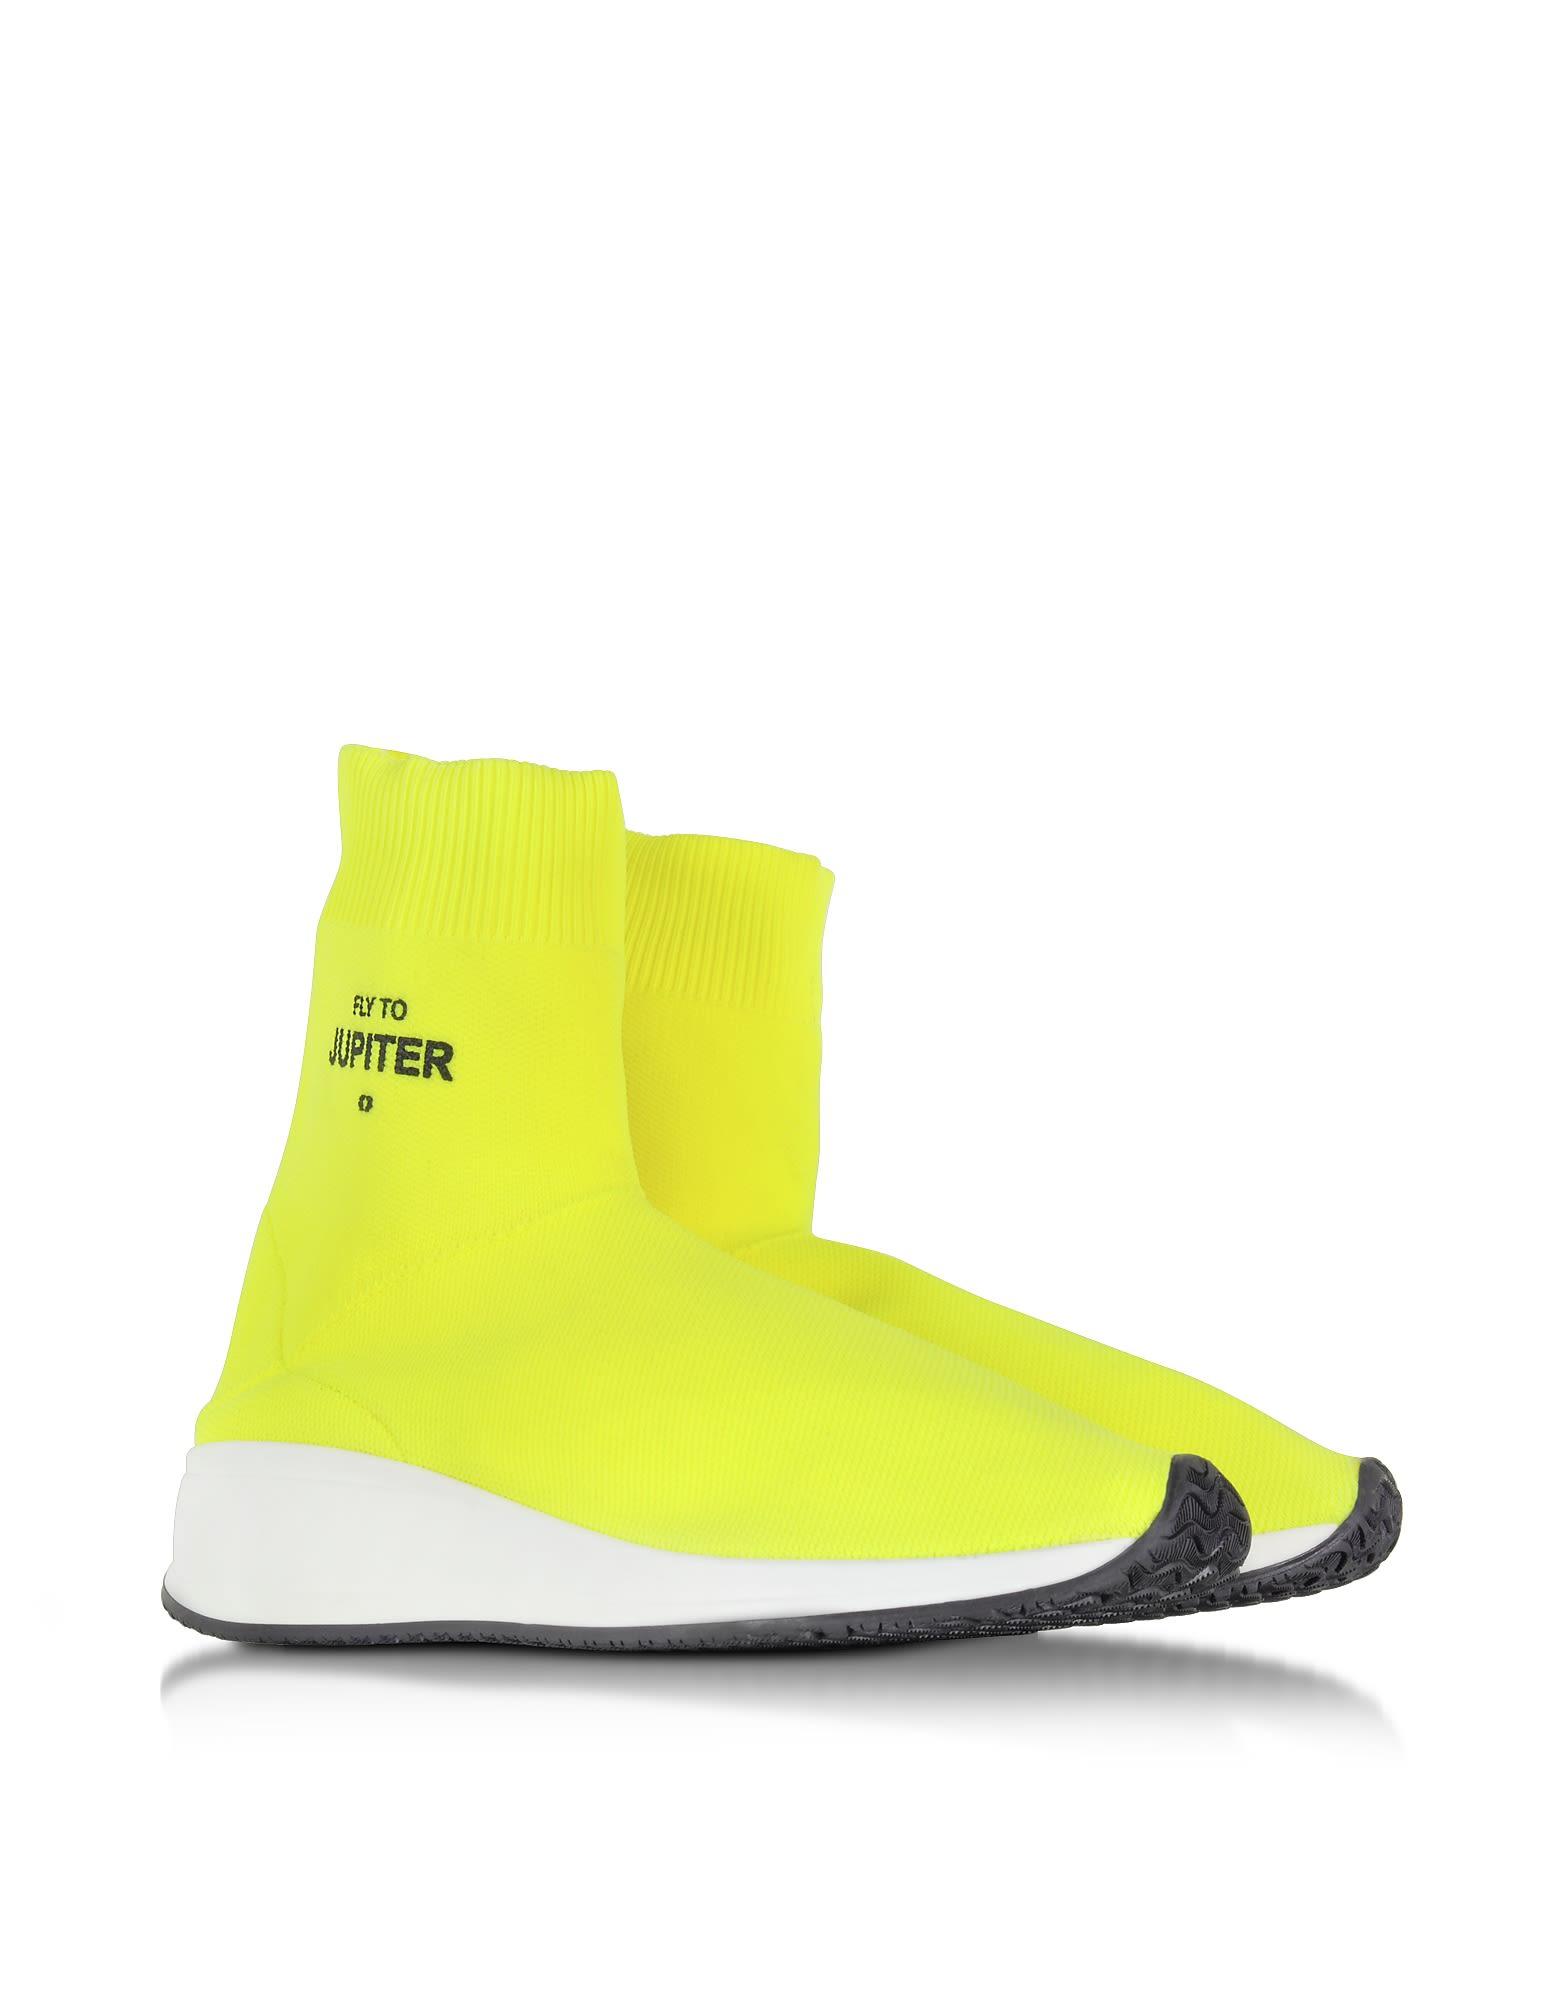 JOSHUA SANDERS Fly To Jupiter Neon Nylon Sock Sneakers Low Shipping Sale Online t5RQ8W